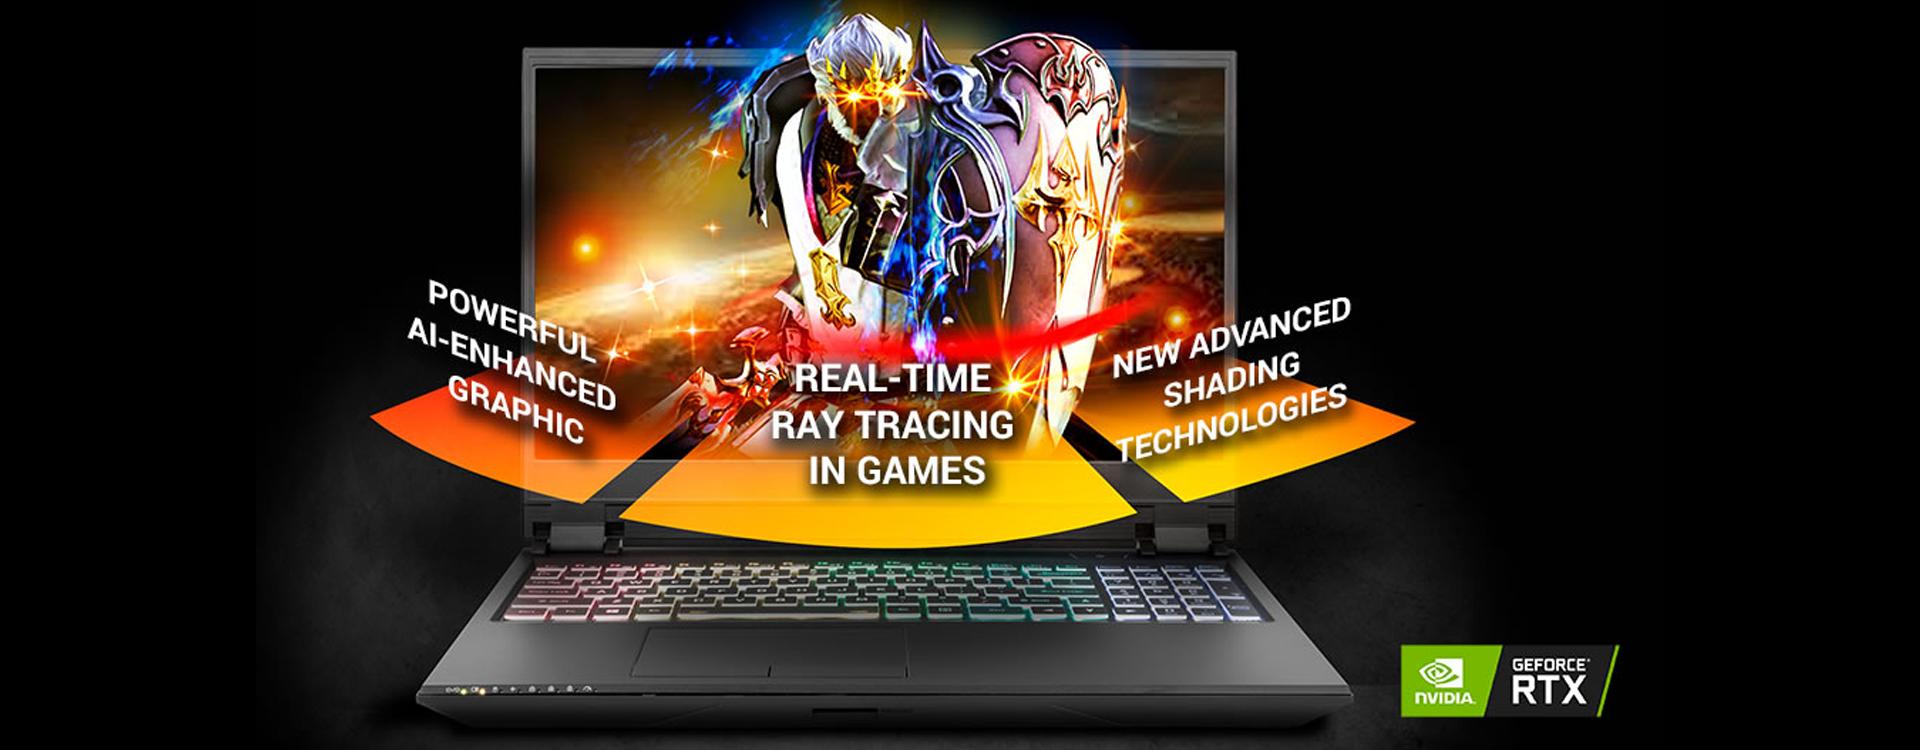 CLEVO PB50RF Intel Core i7-9750H | NVIDIA RTX 2070 VR | 4K